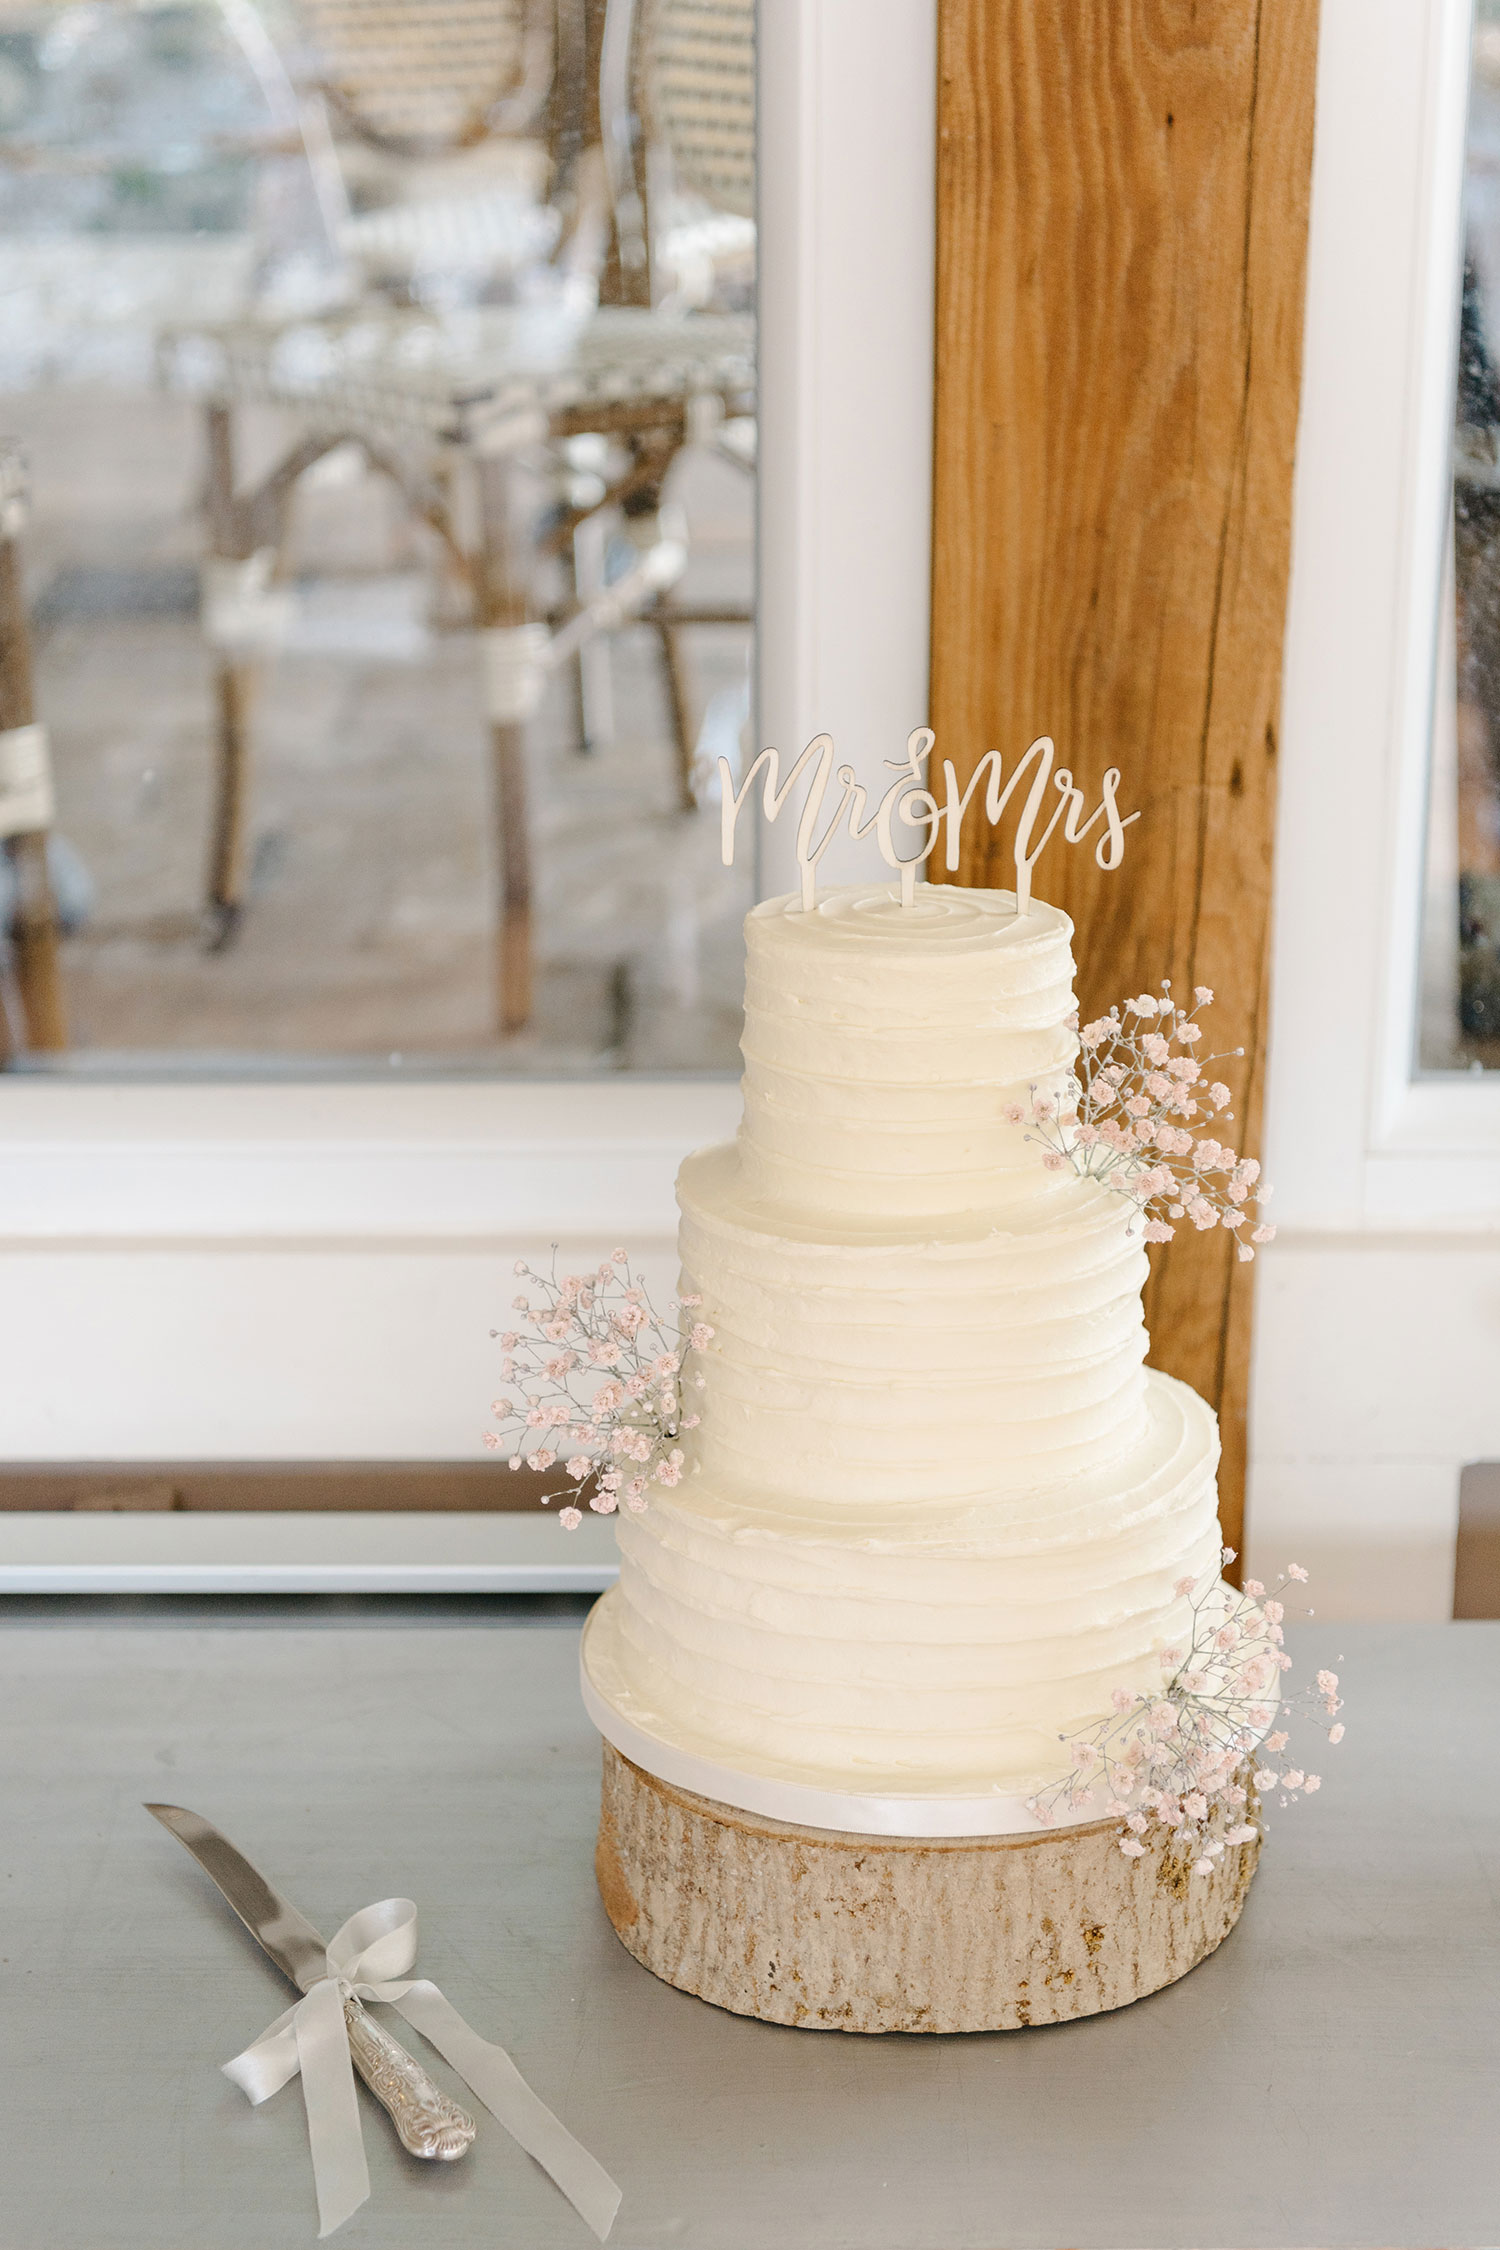 destination-wedding-photographer-ballinacurra-house-wedding-20180711_0064.jpg